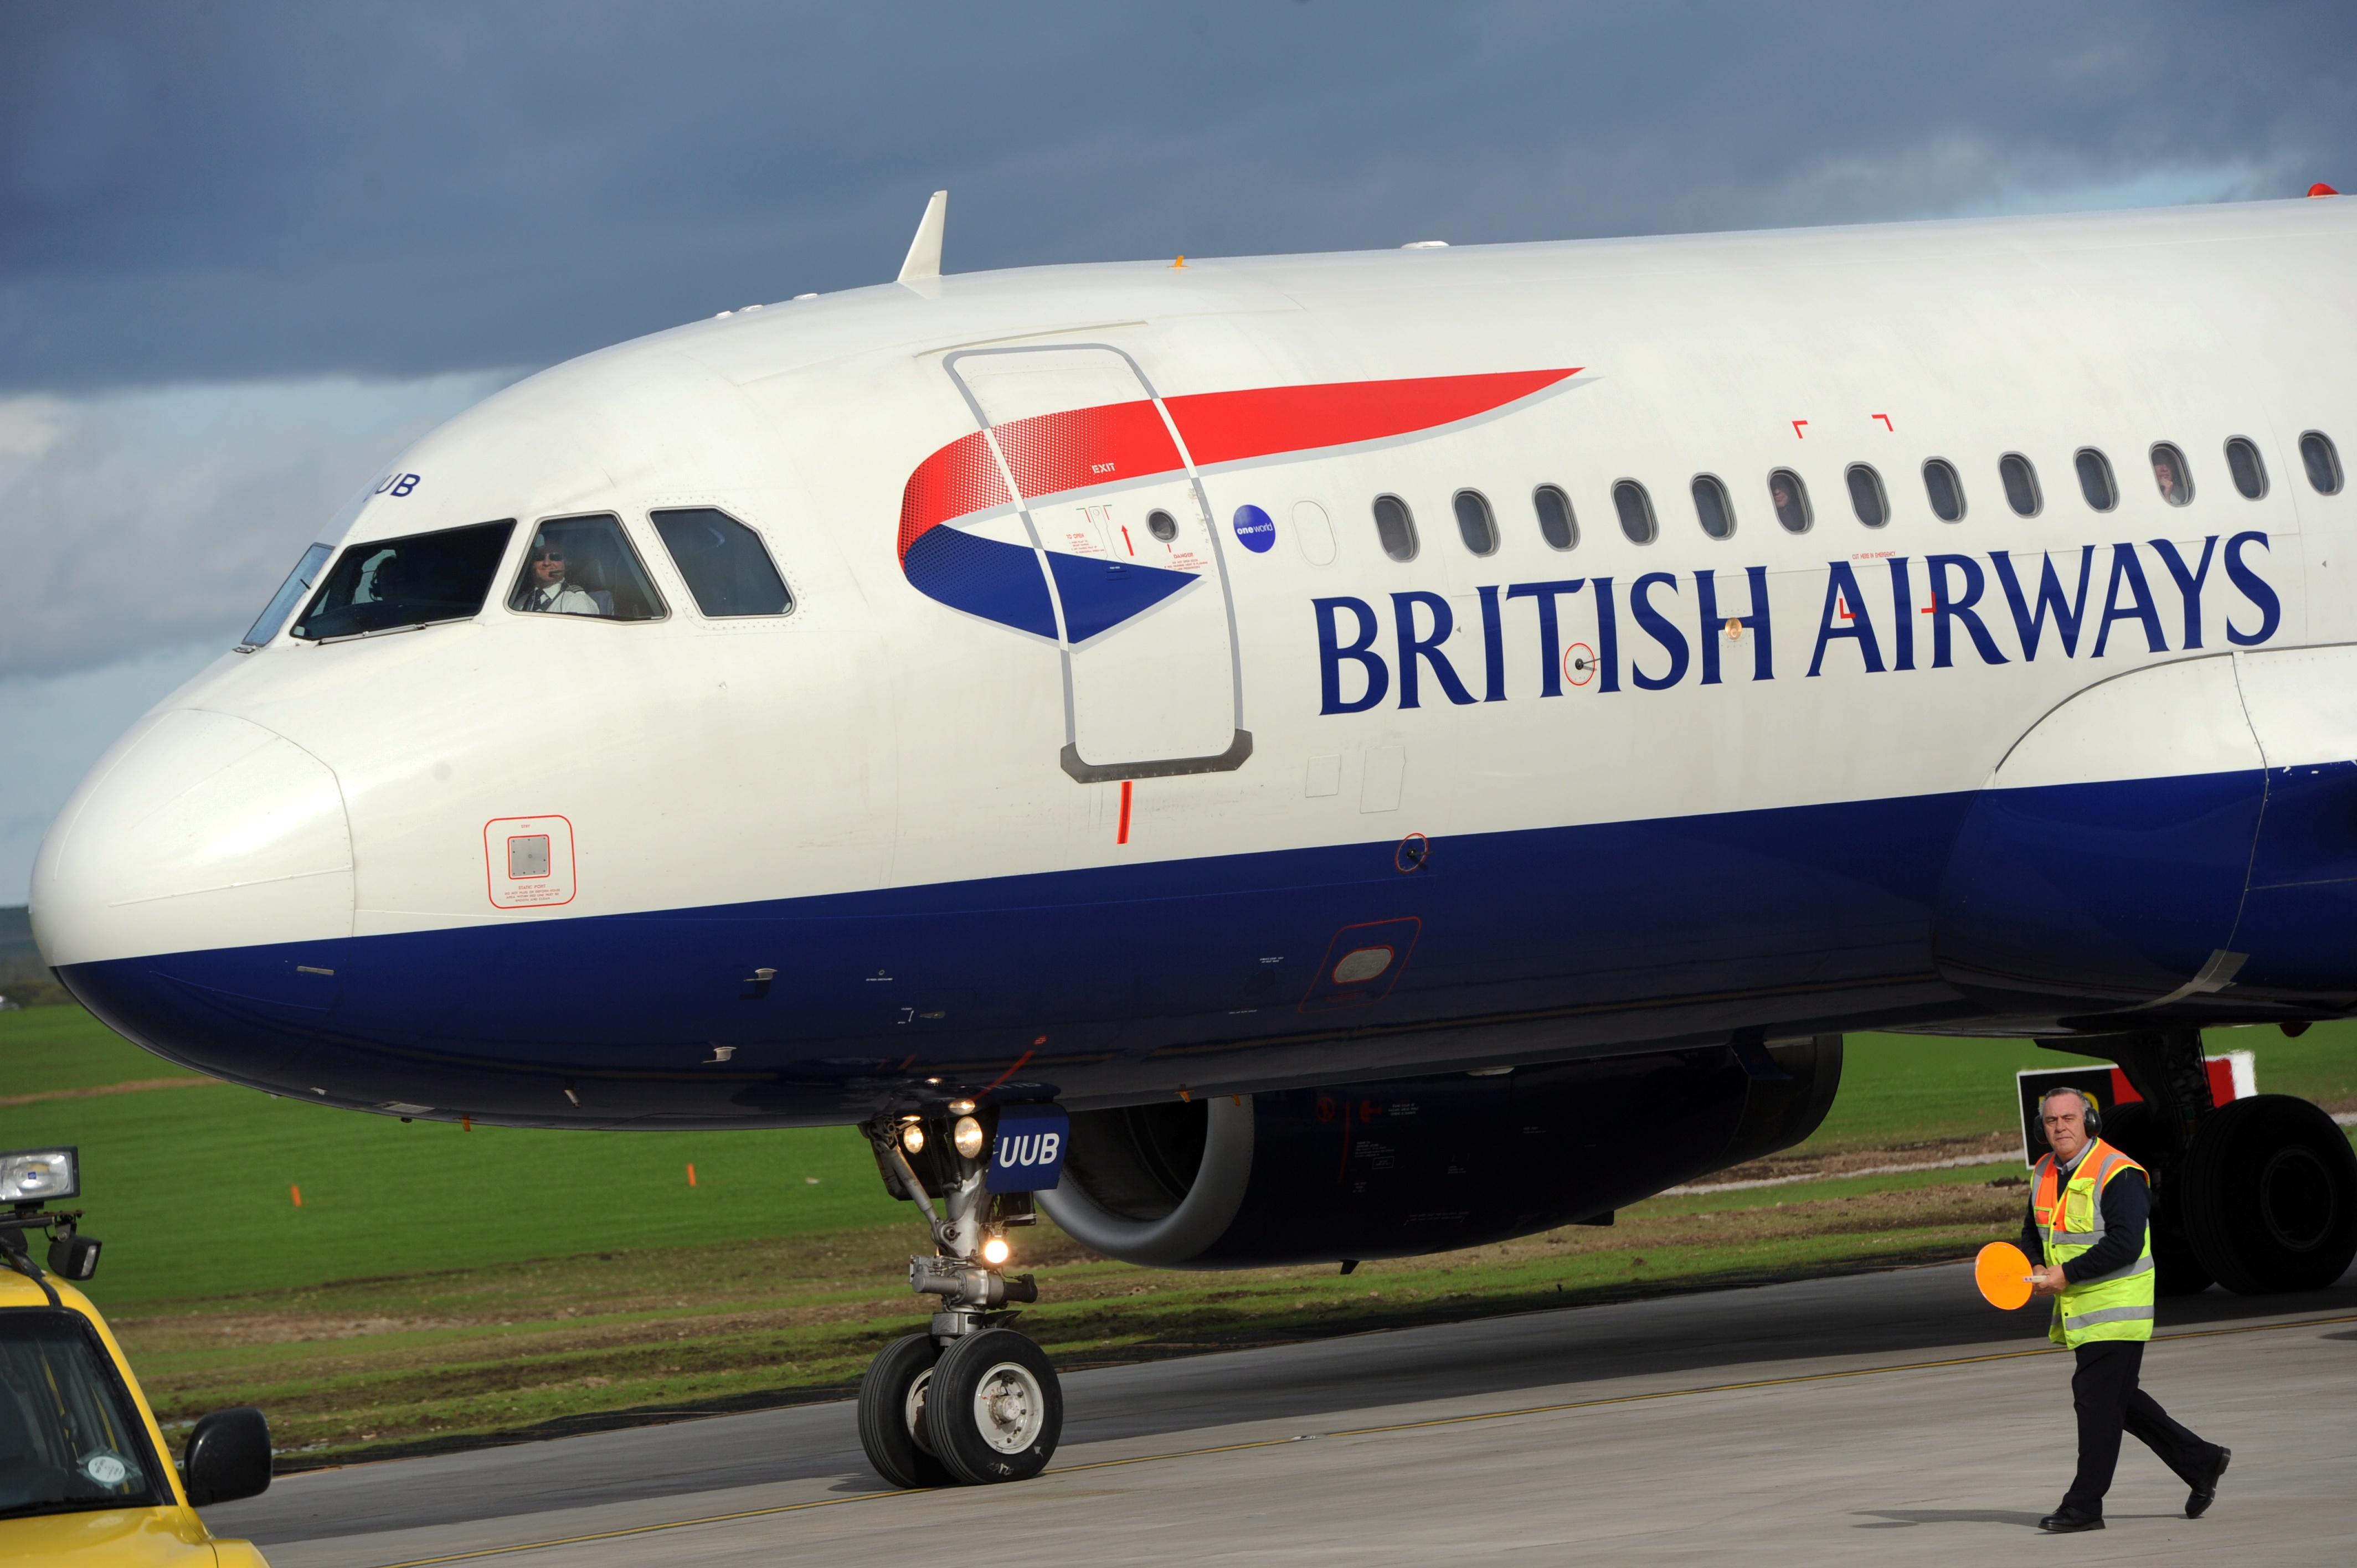 A British Airways aircraft arrives at Aberdeen airport